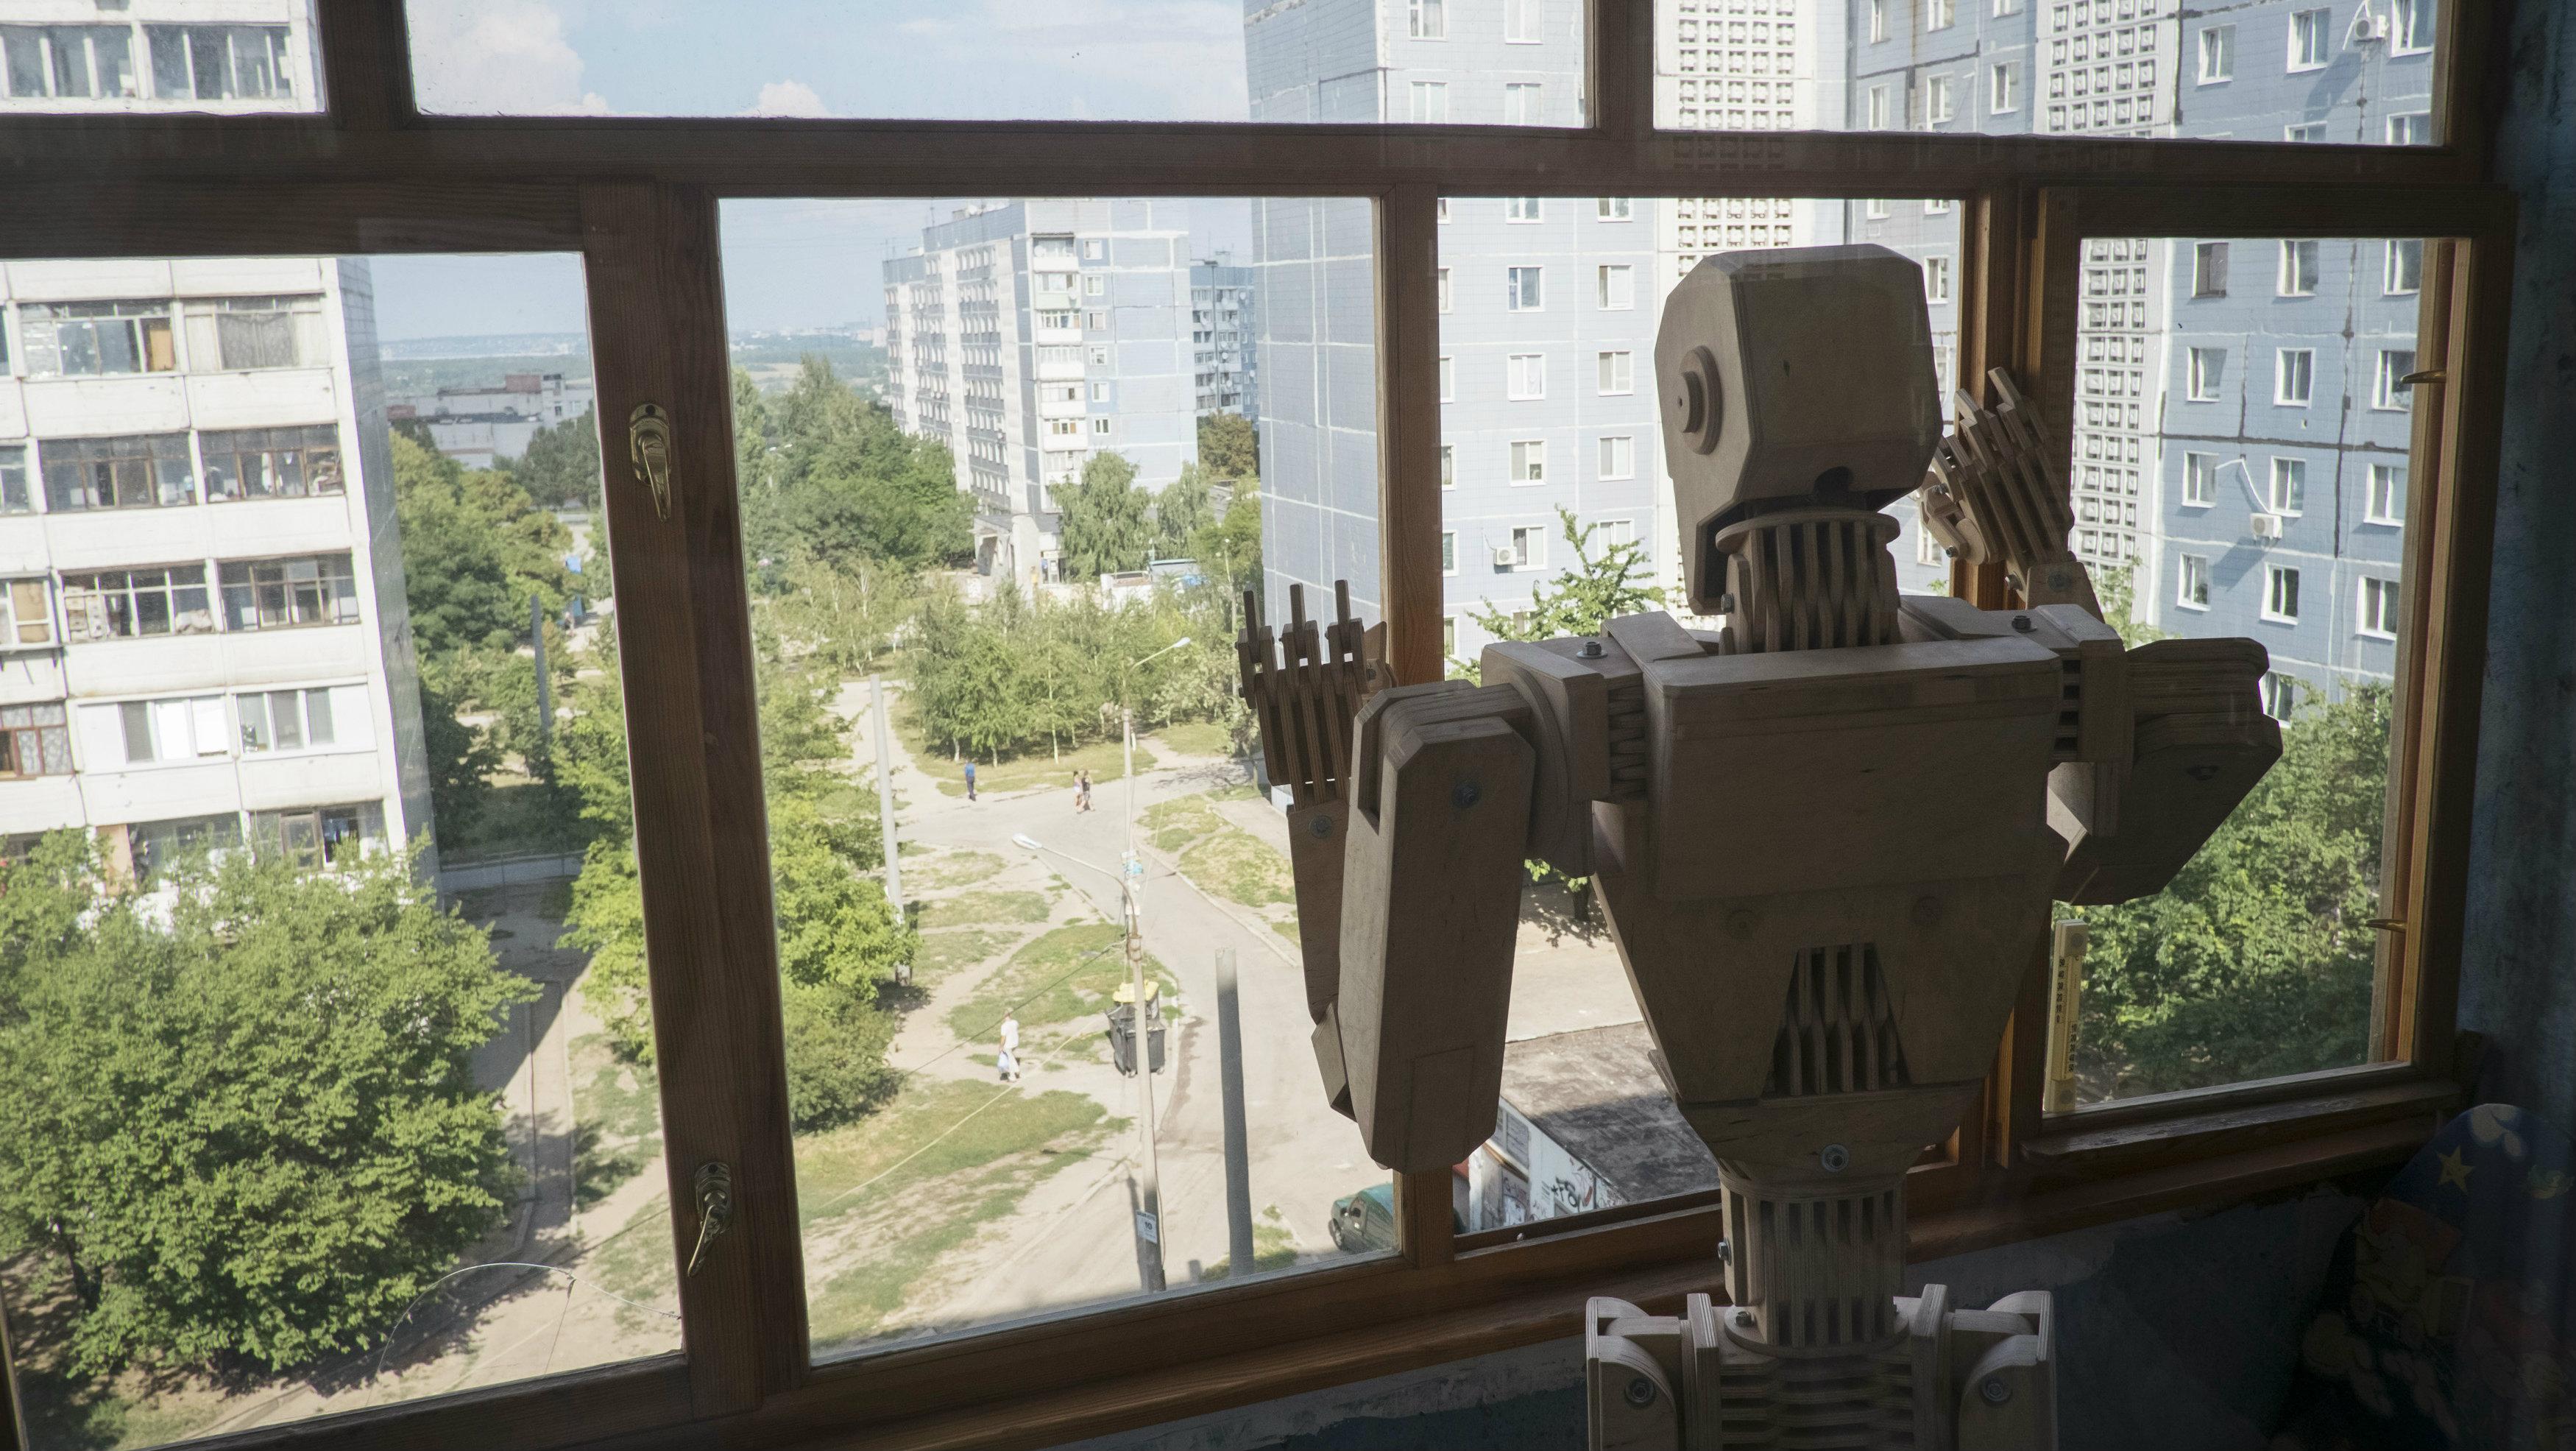 Algorithms make better hiring decisions than humans